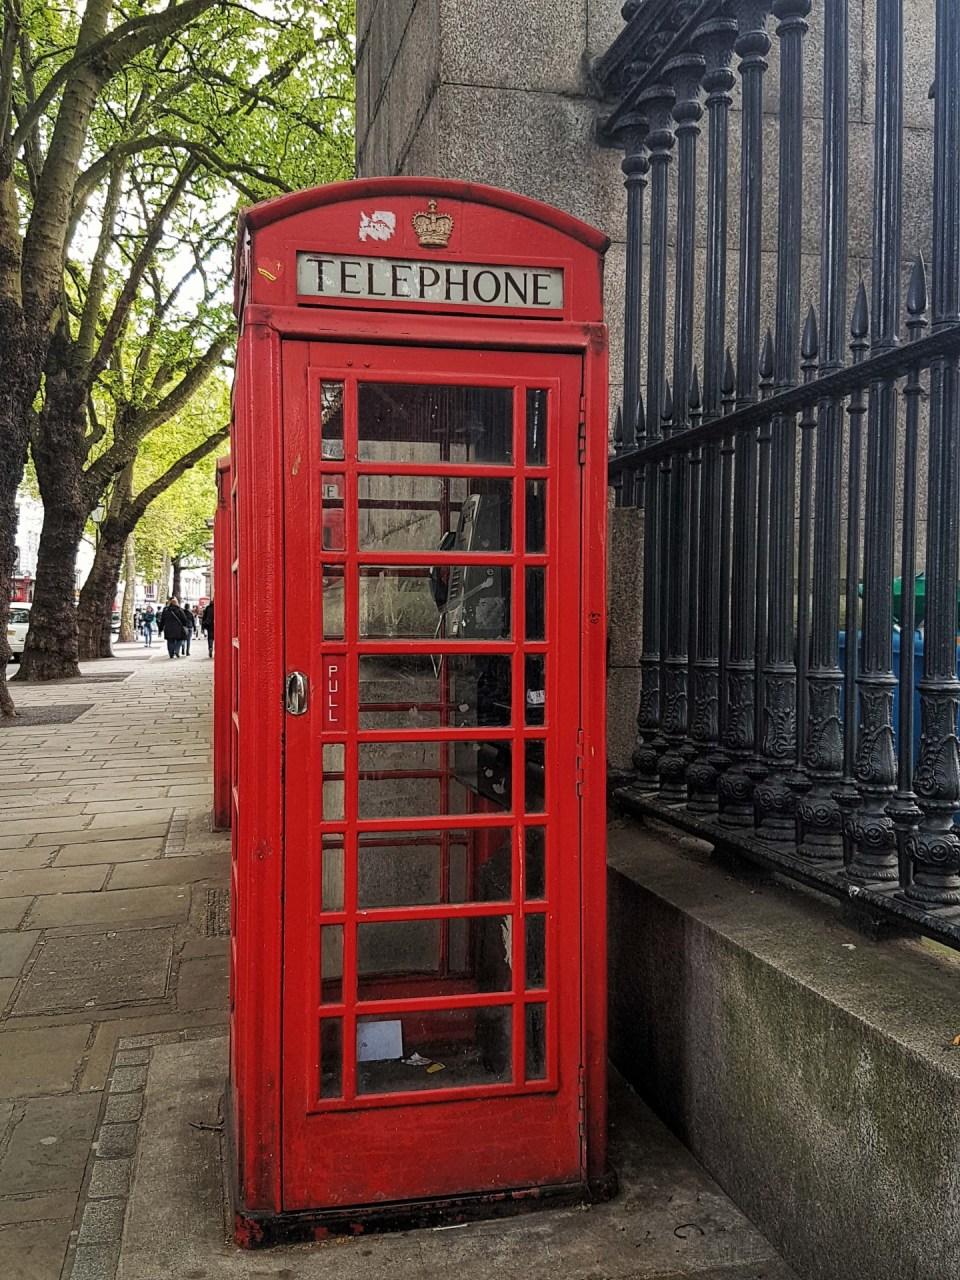 fromthecornertable, travelblog, travelblogger, england, englandcities, englandtowns, englandvillages, english, unitedkingdom, travelengland, travelUK, things-to-see, must-see-england, must-visit-england, london, londonphonebooth, phonebooth